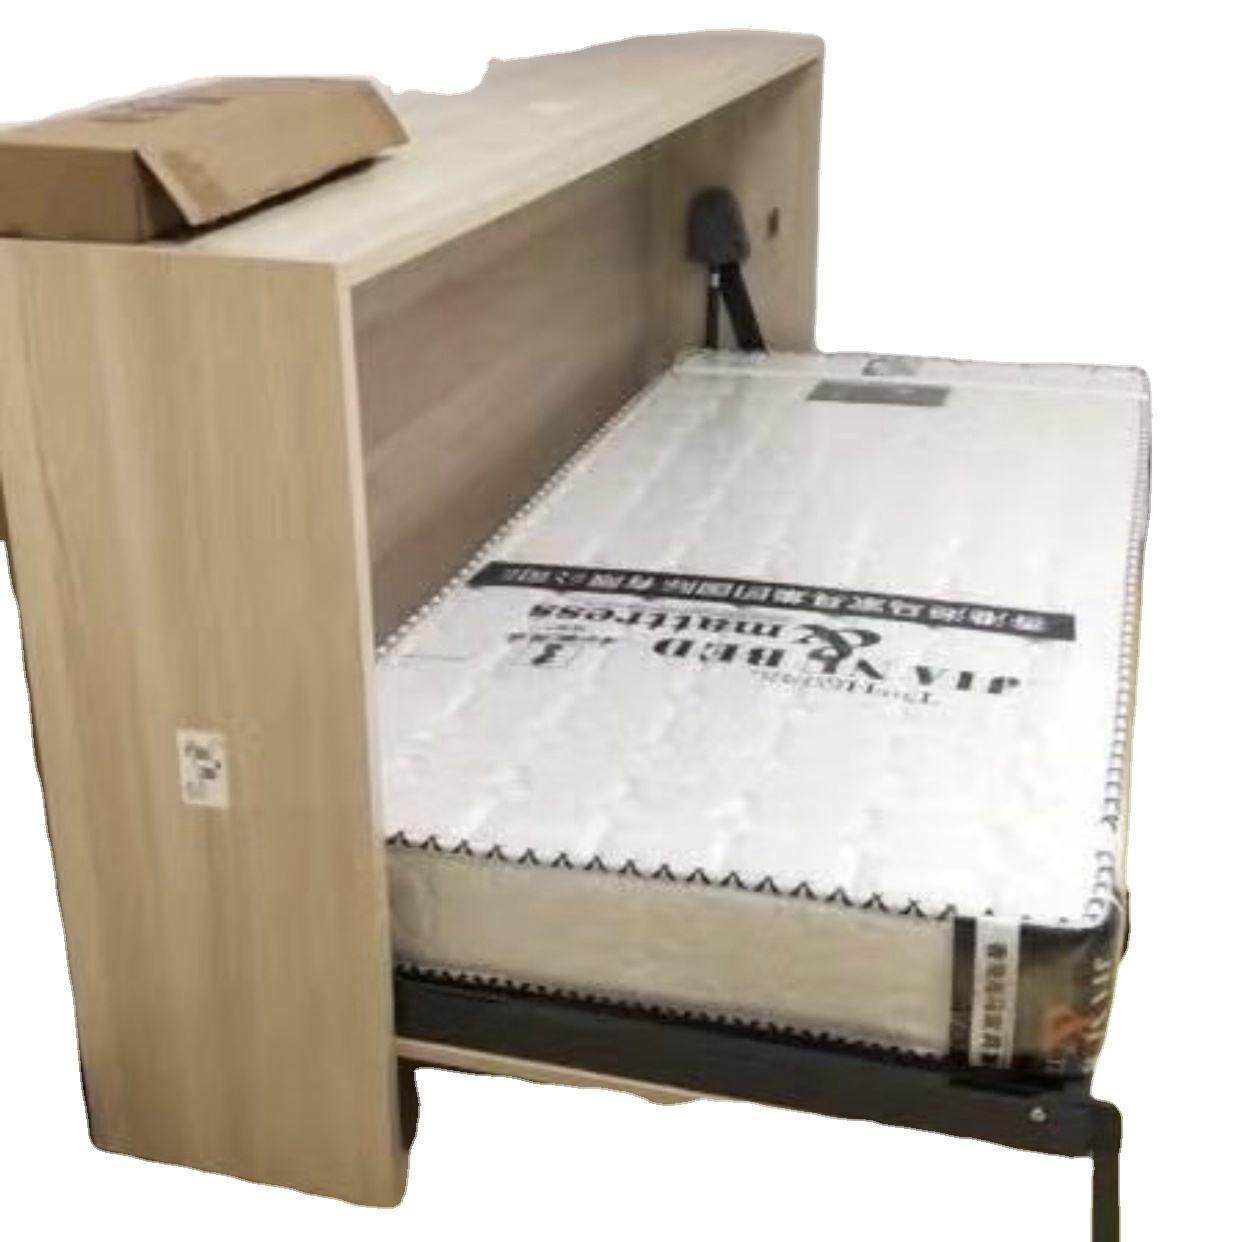 Customization Mdf Beds Modern Cabinet Foldilng Murphy Smart Home Furniture Bed For Living Room Furniture